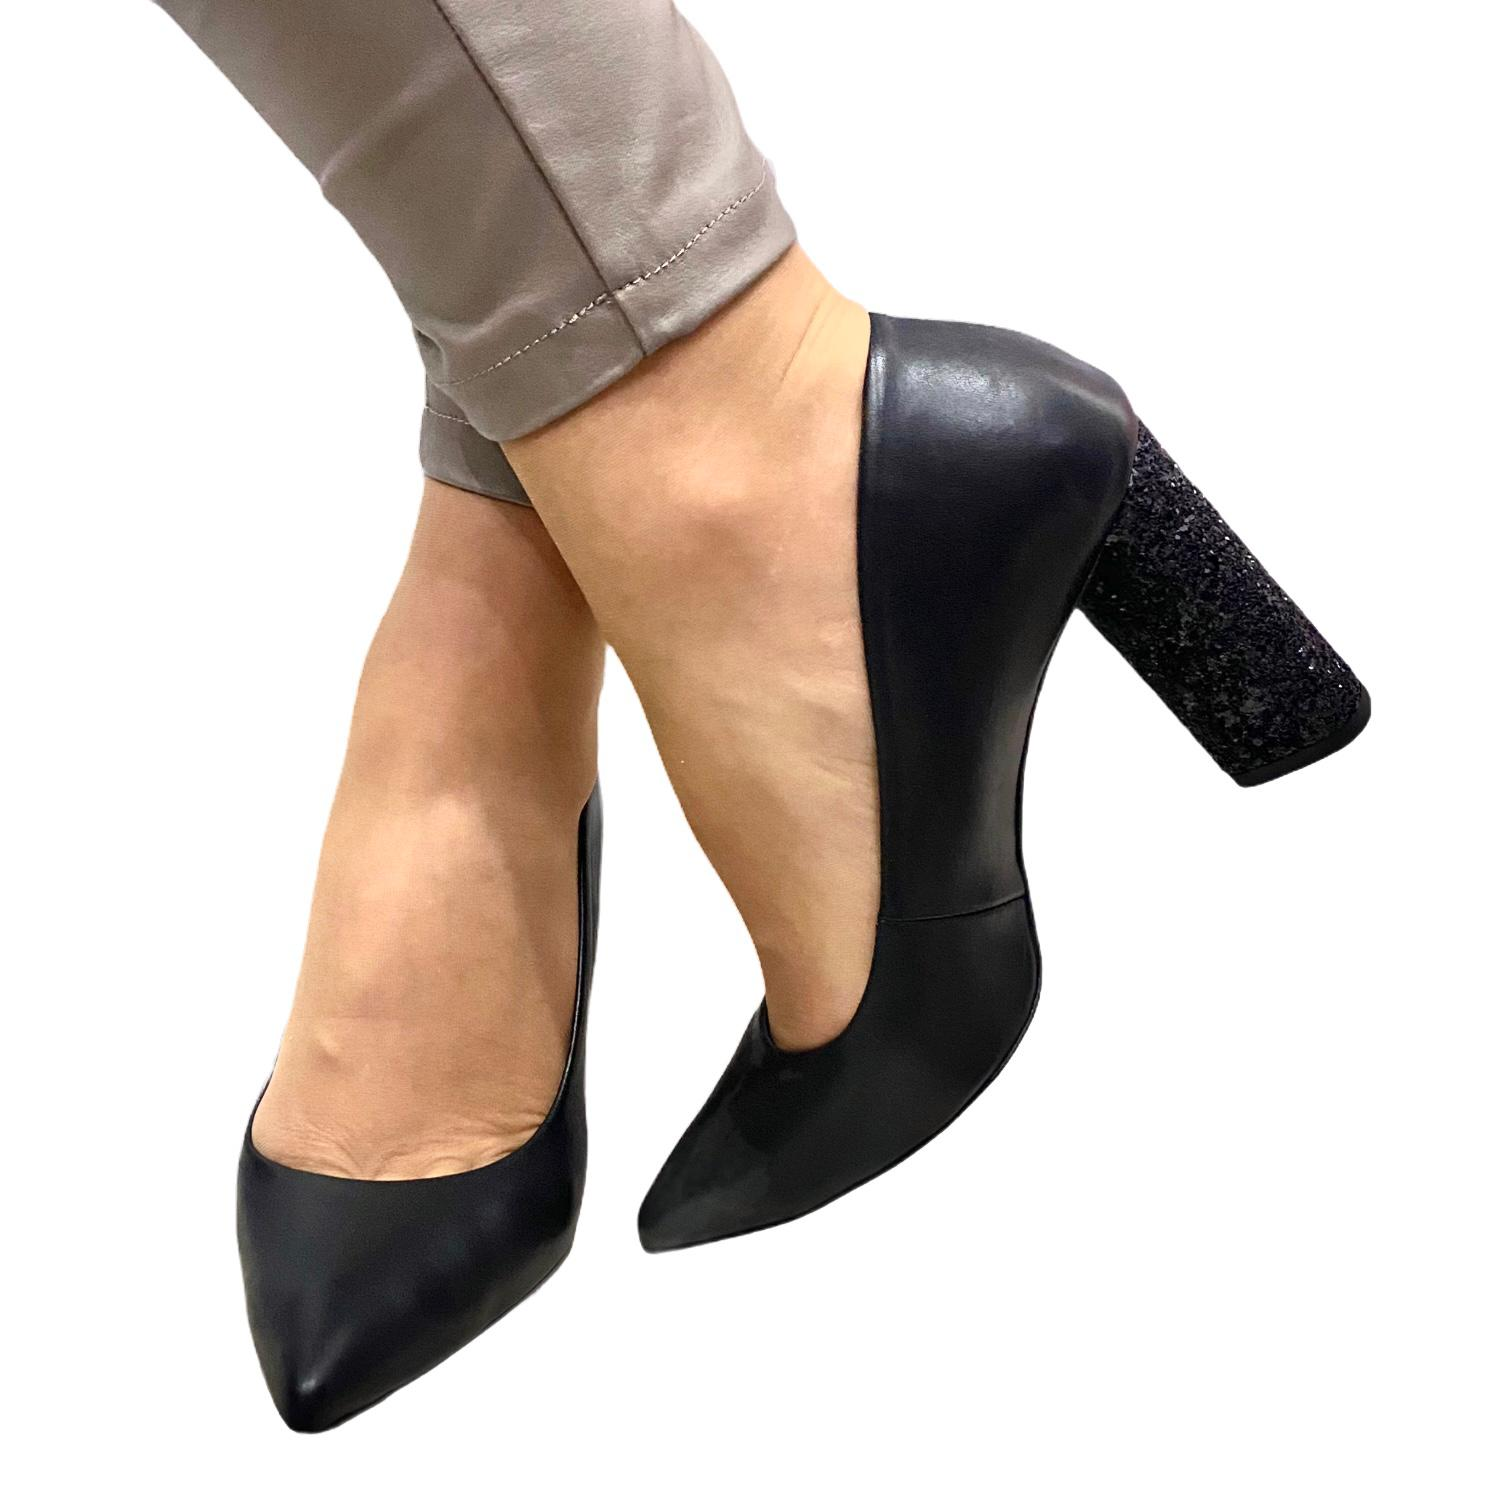 Pantofi Kordel negri cu toc cu sclipici